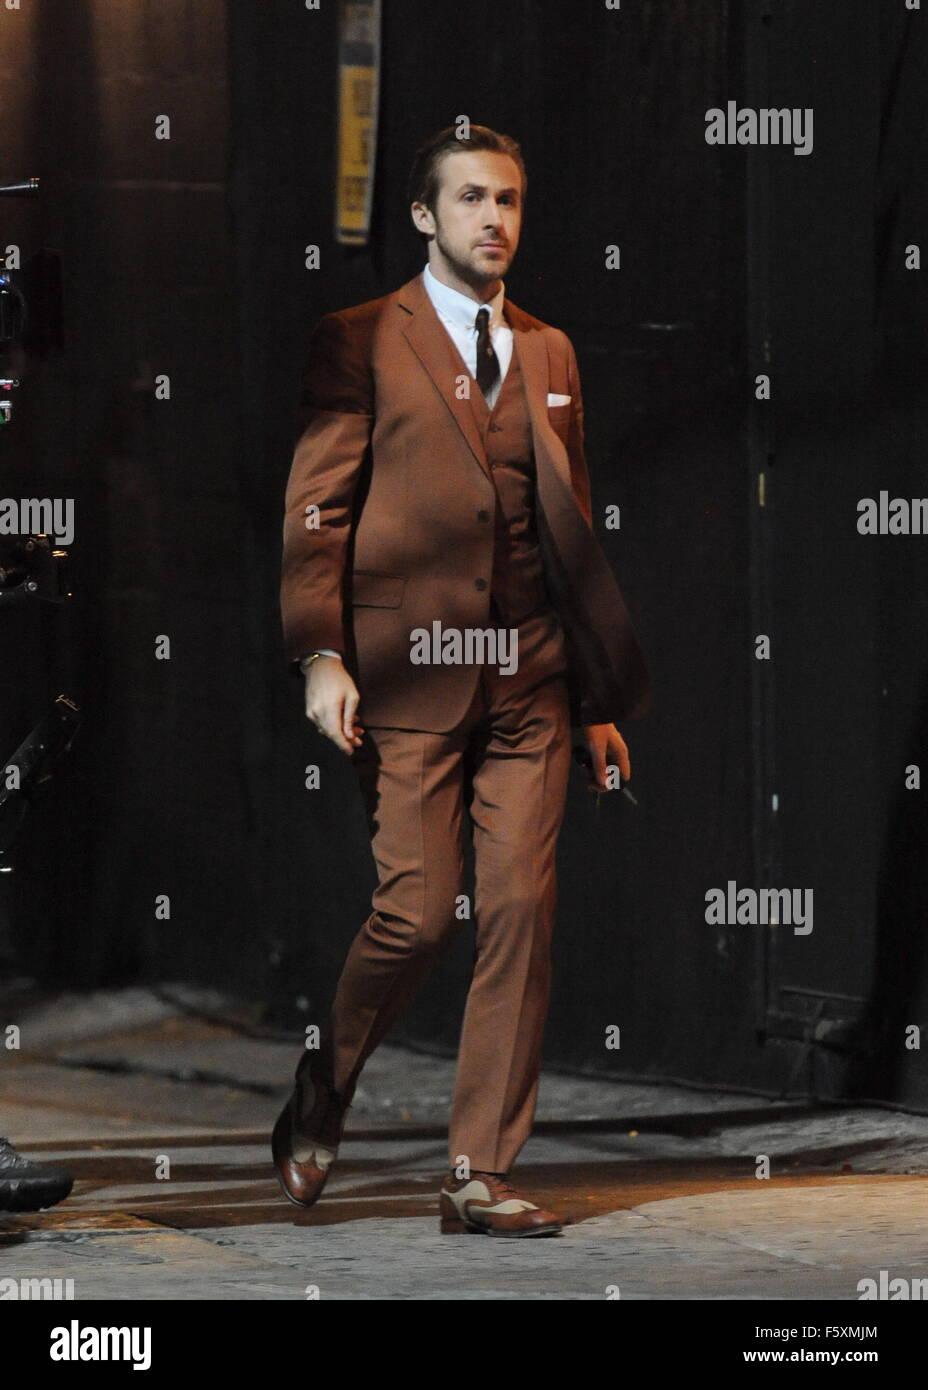 Ryan Gosling La La Land : gosling, Gosling, Sports, Vintage, Brown, Scene, Land,', Stock, Photo, Alamy